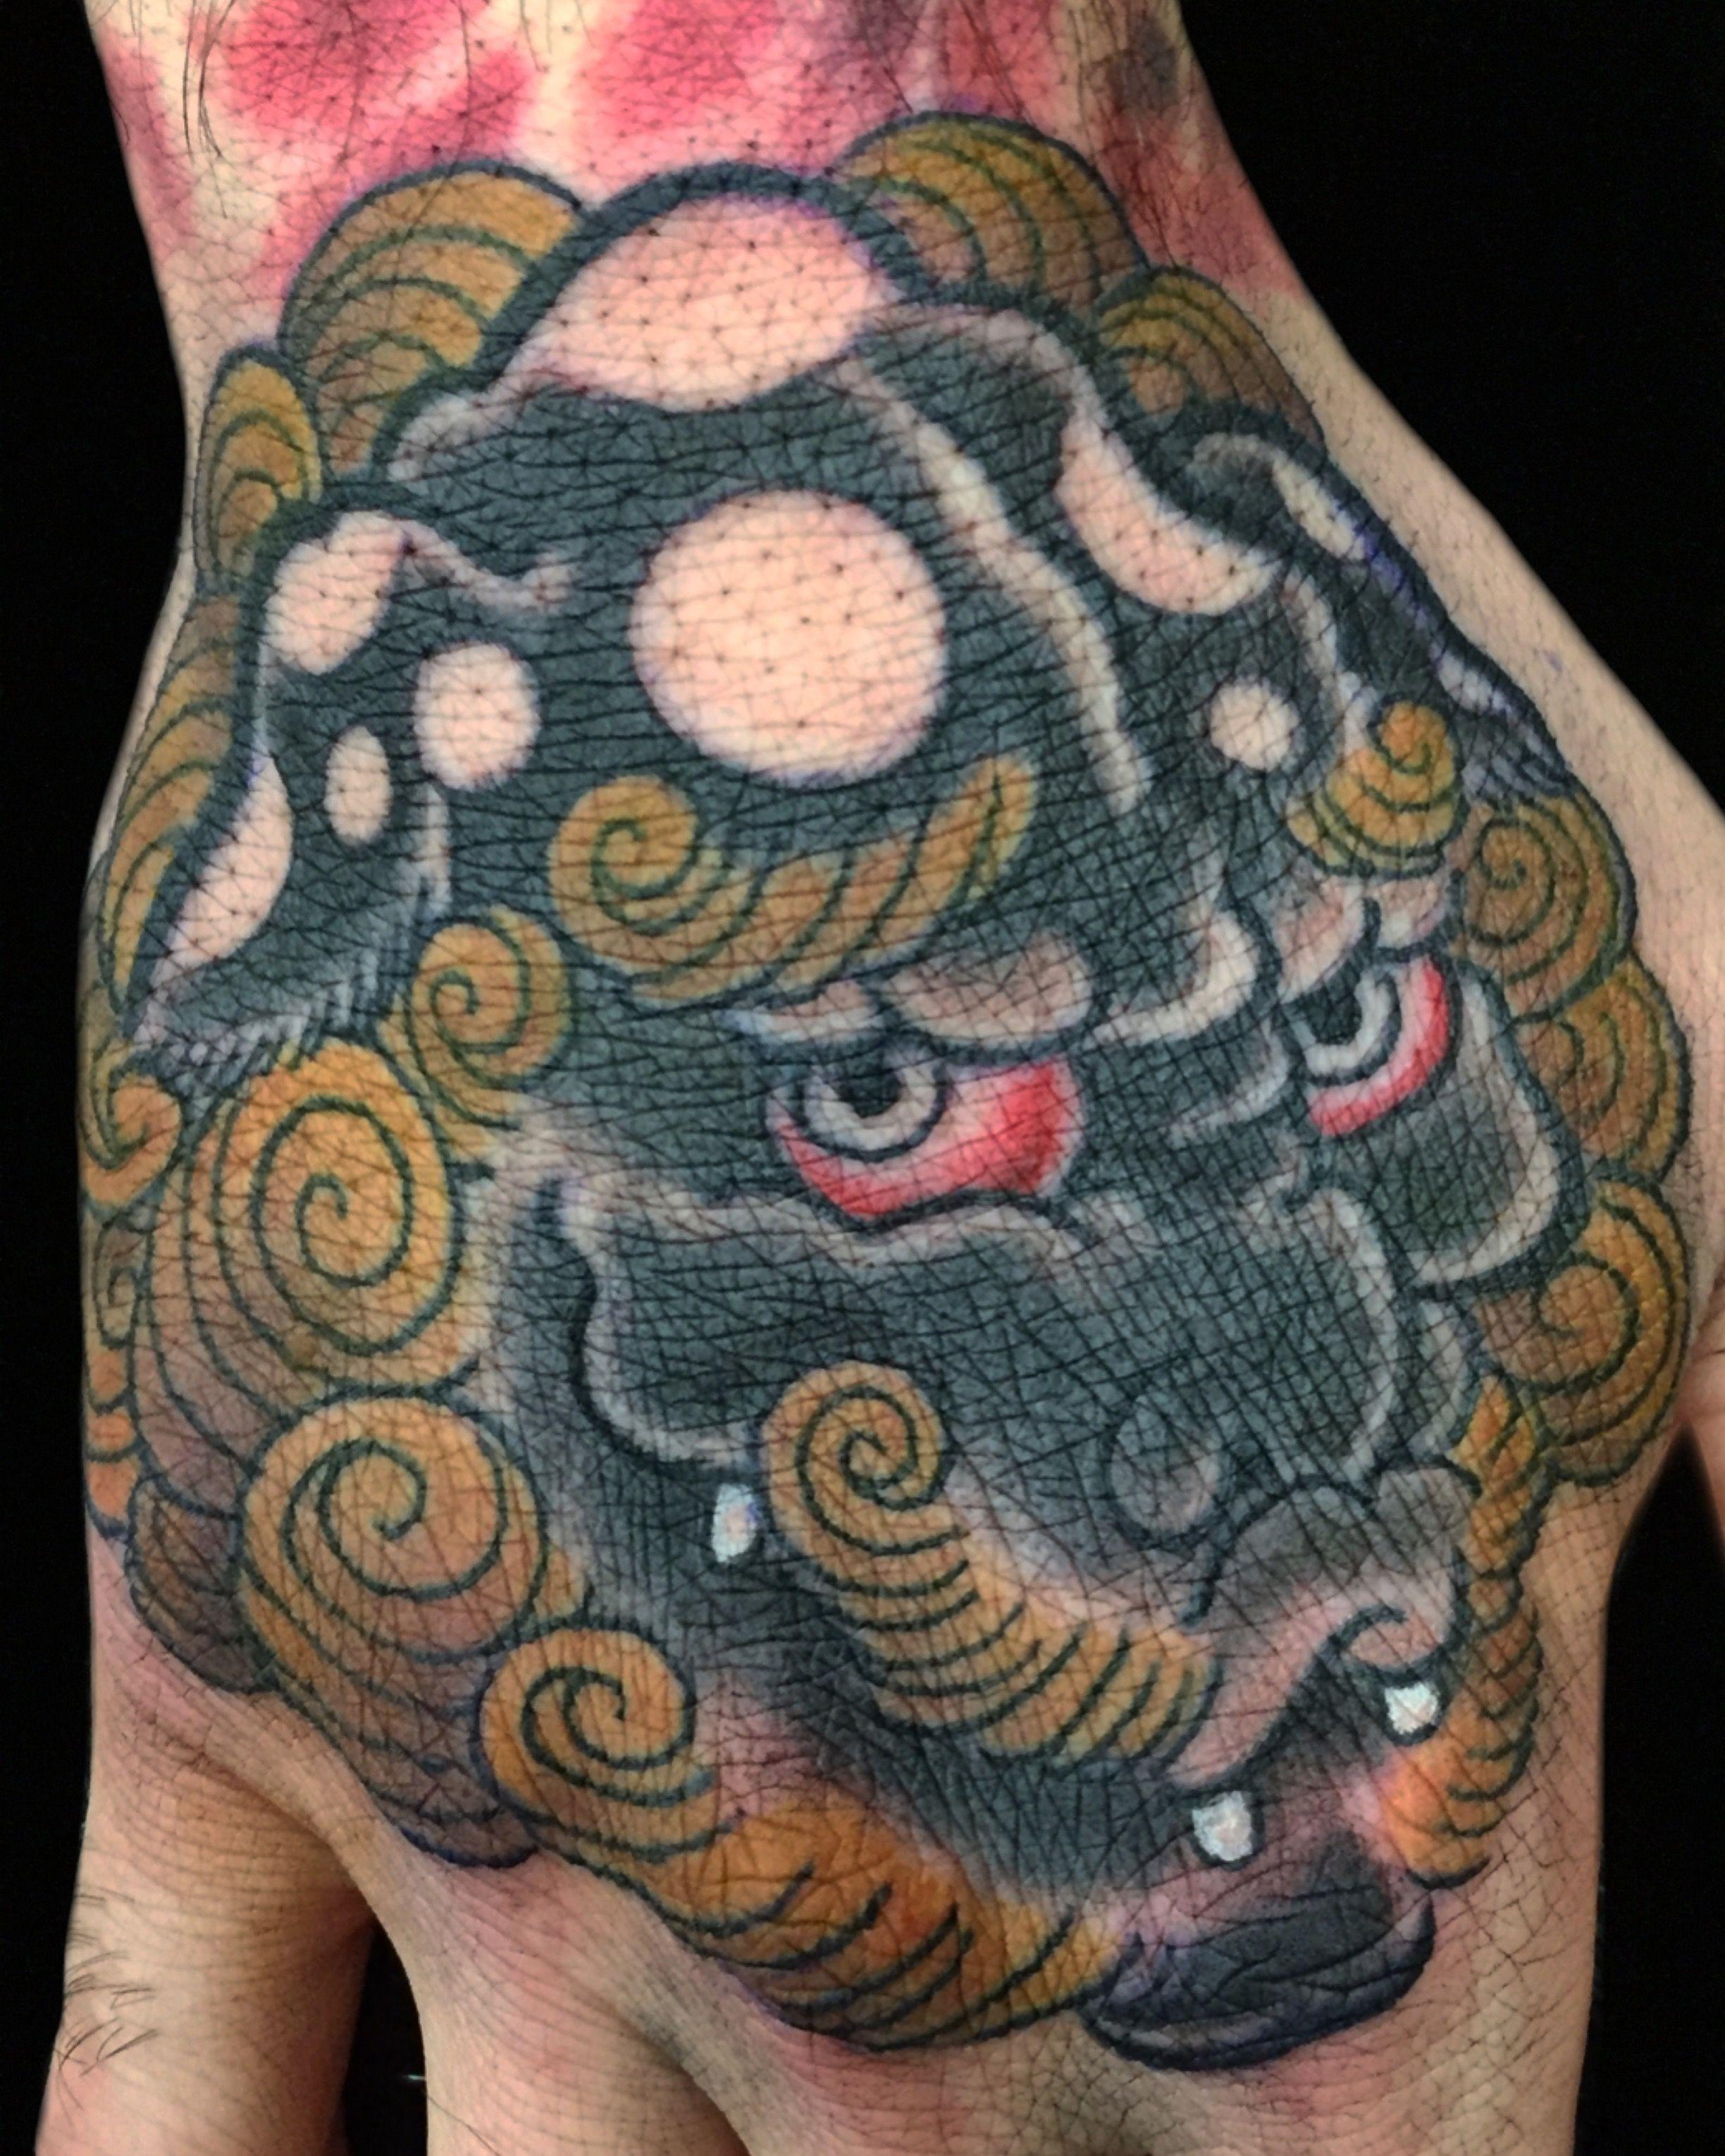 Karajishi Shishi Japanese Style Tattoos By Cindy Maxwell Seventh Son Tattoo San Francisco California Dark Age Tattoo Seattle Wa Instagram Cindy Maxwe